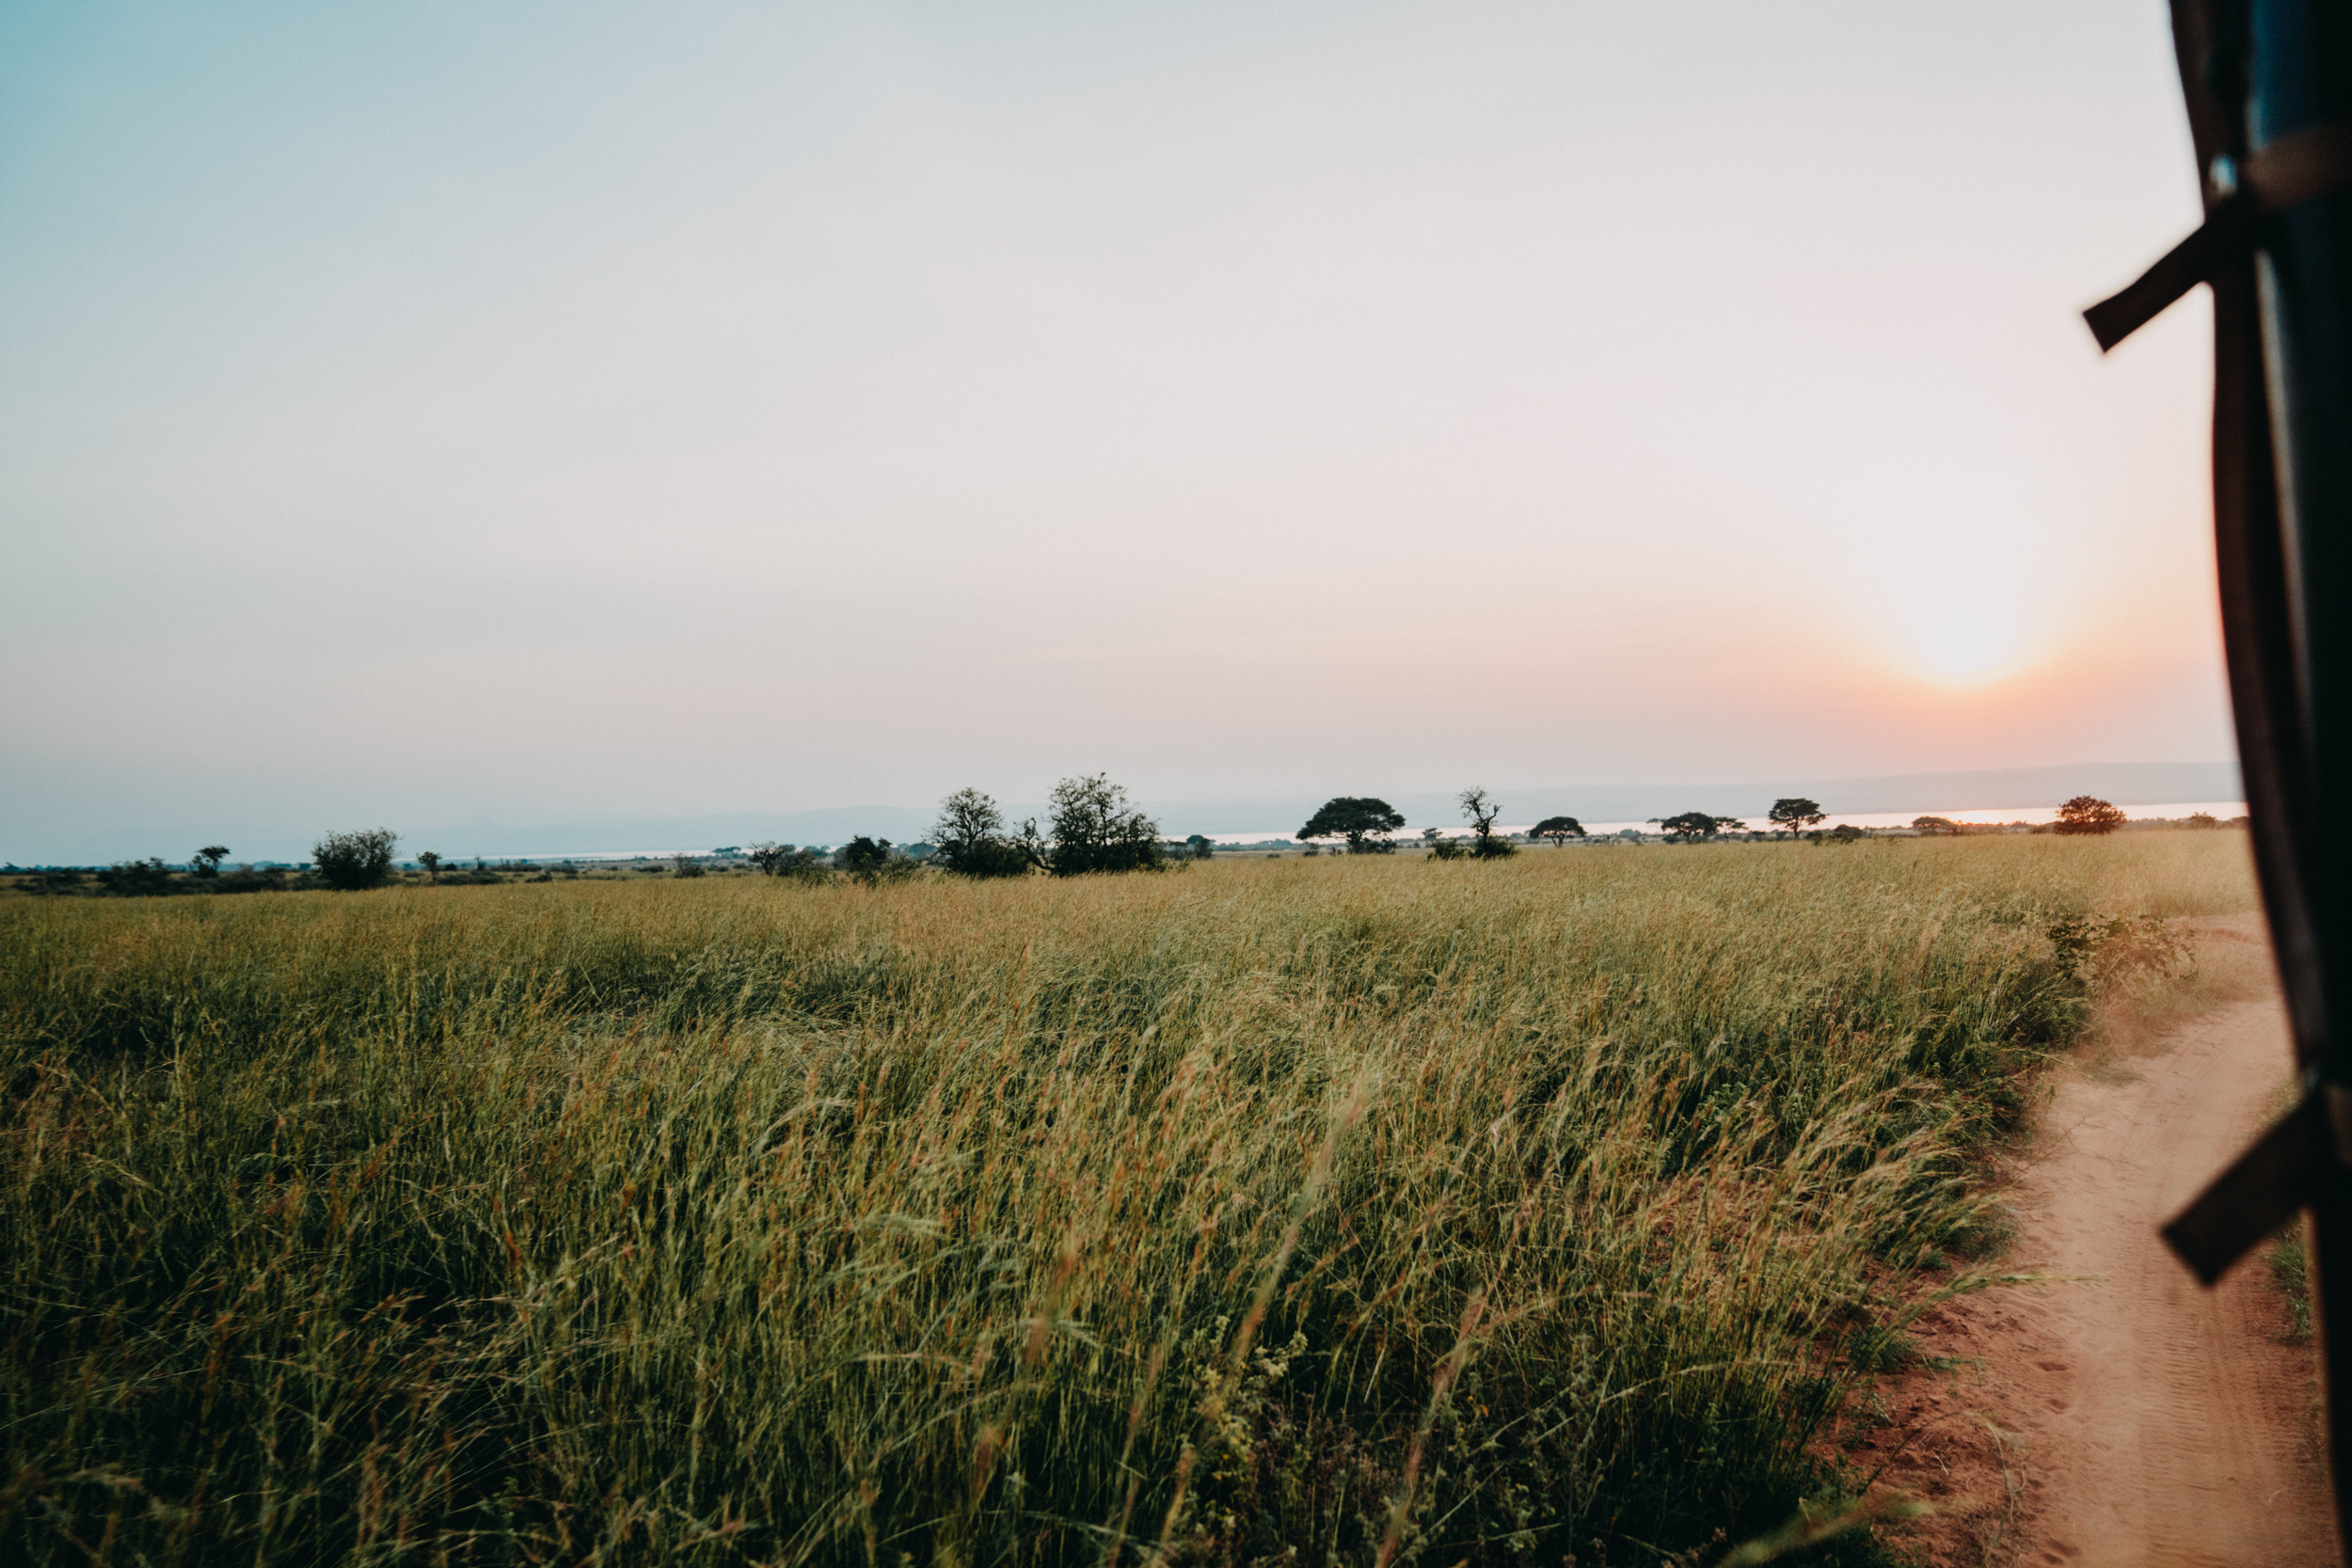 uganda july 2018-302.jpg